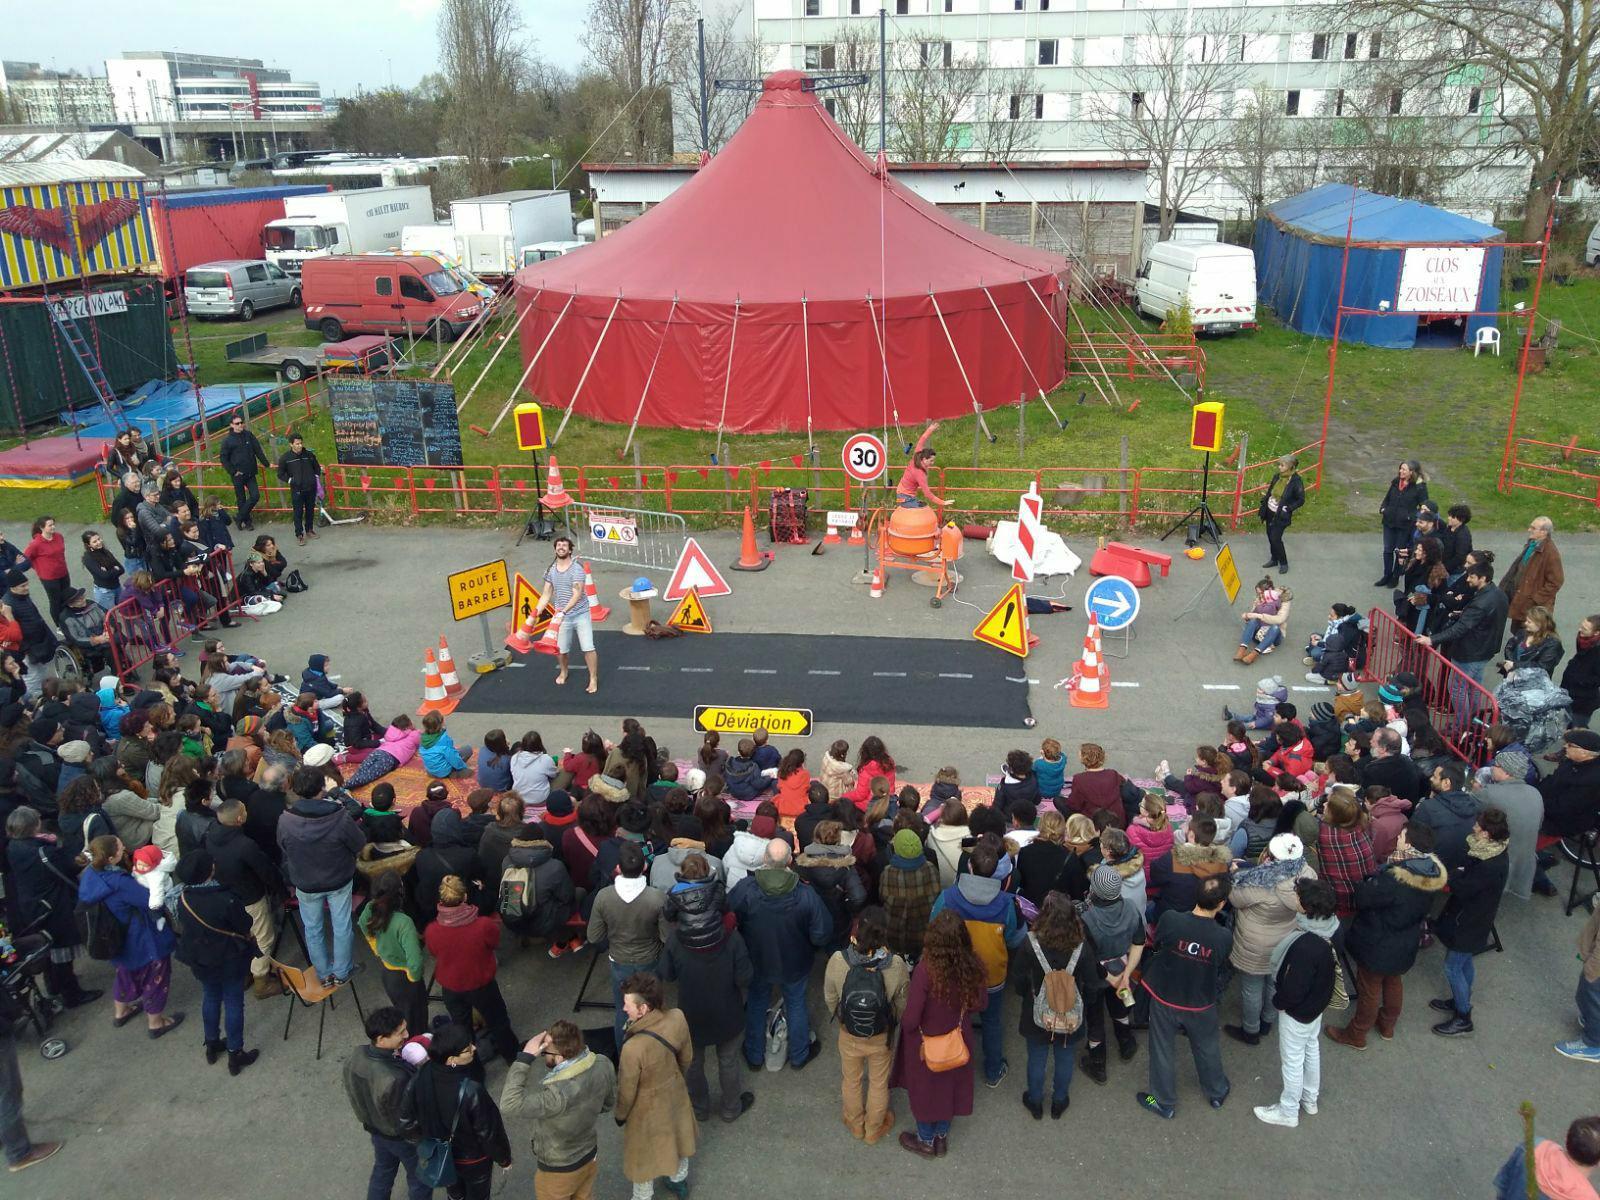 Les Noctambules - Nanterre - Avril 2018